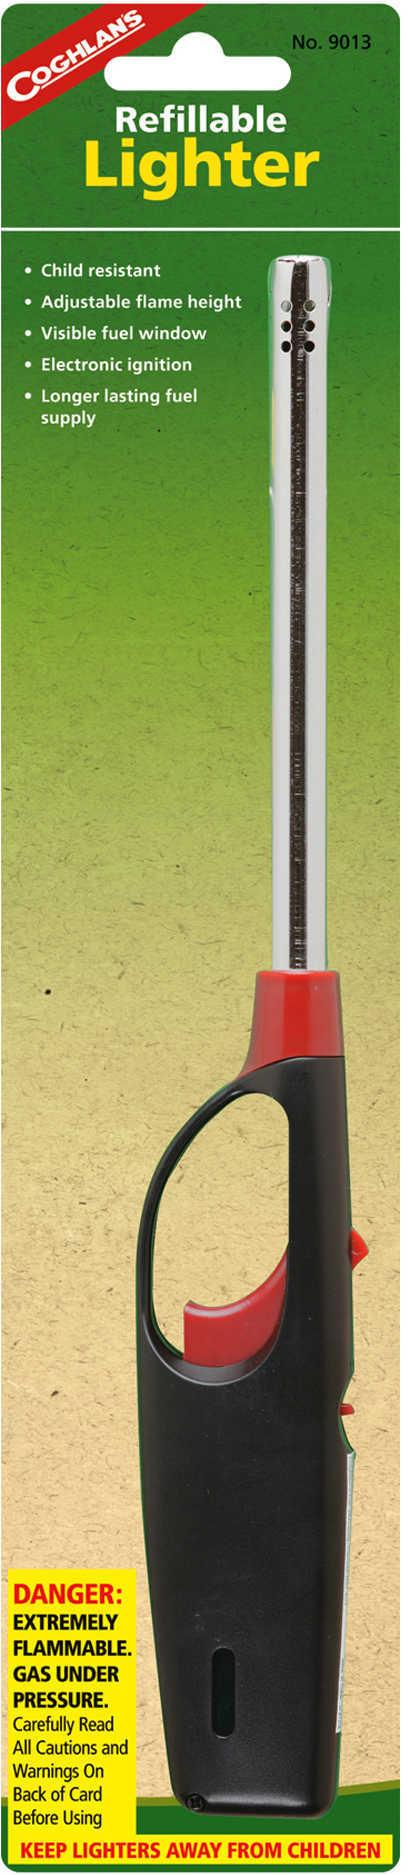 COGHLANS Refillable Gas Lighter Md: 9013